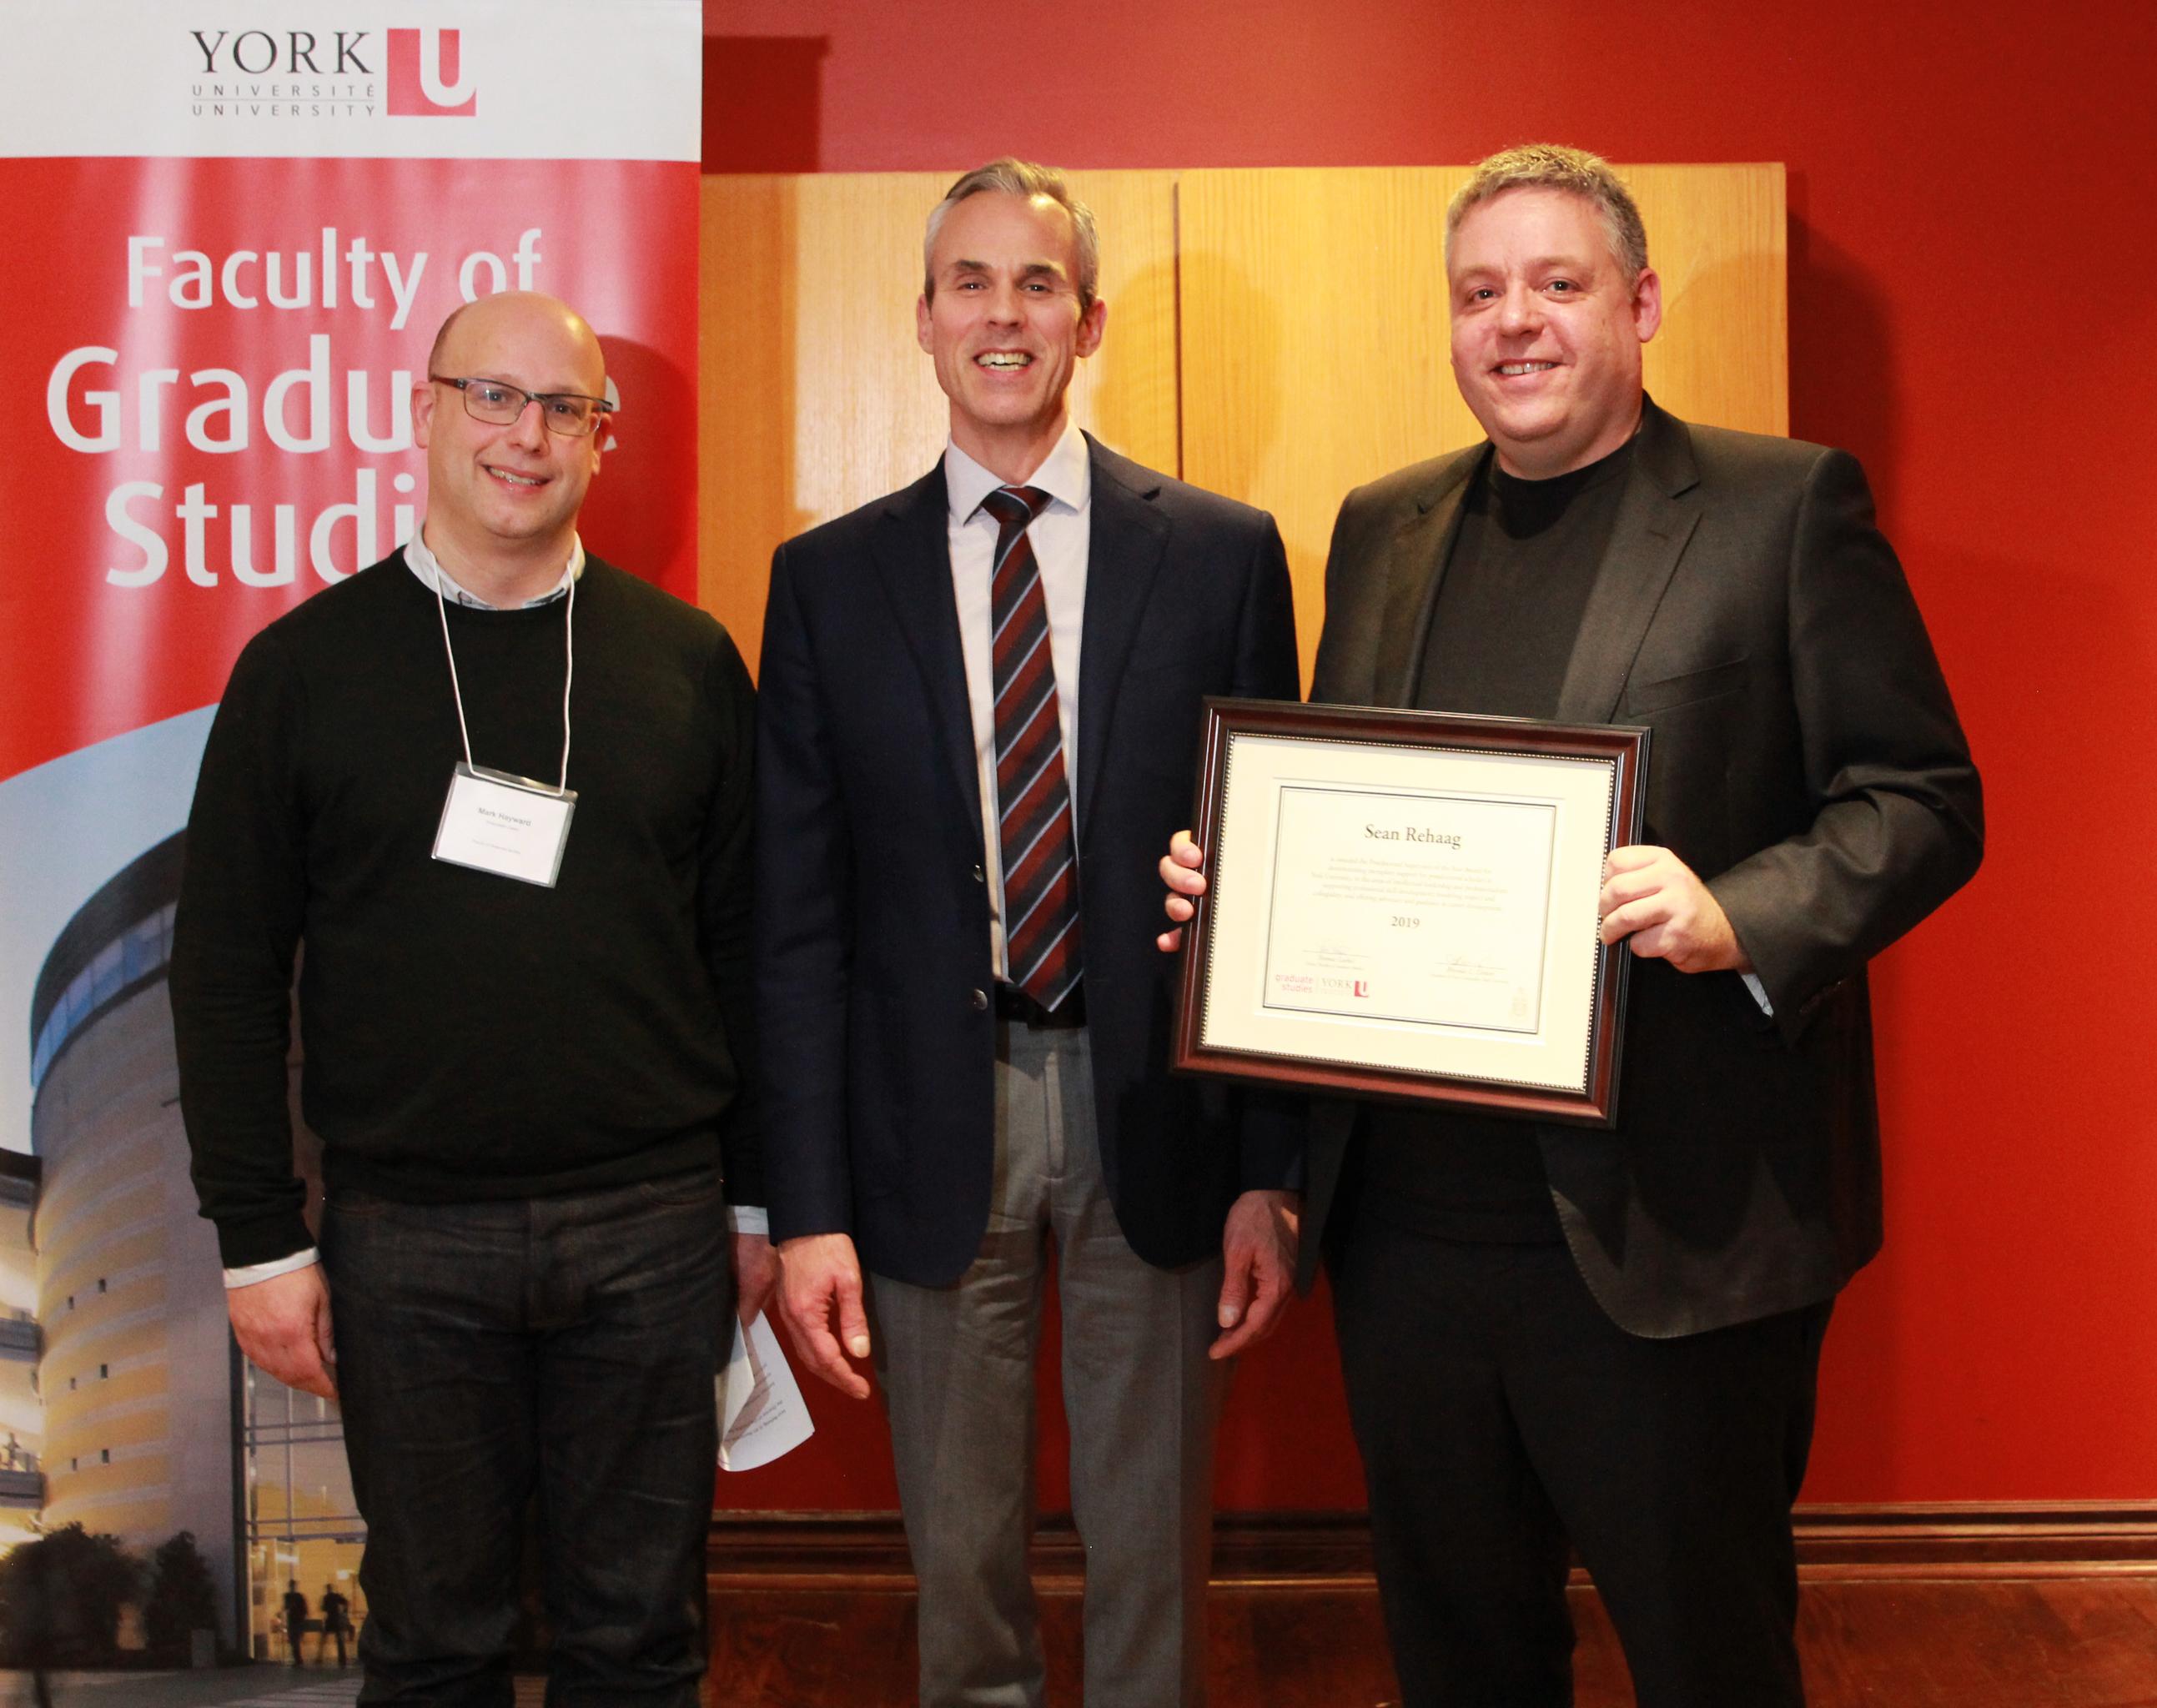 photo of Mark Hayward, Dean Thomas Loebel and Sean Rehaag